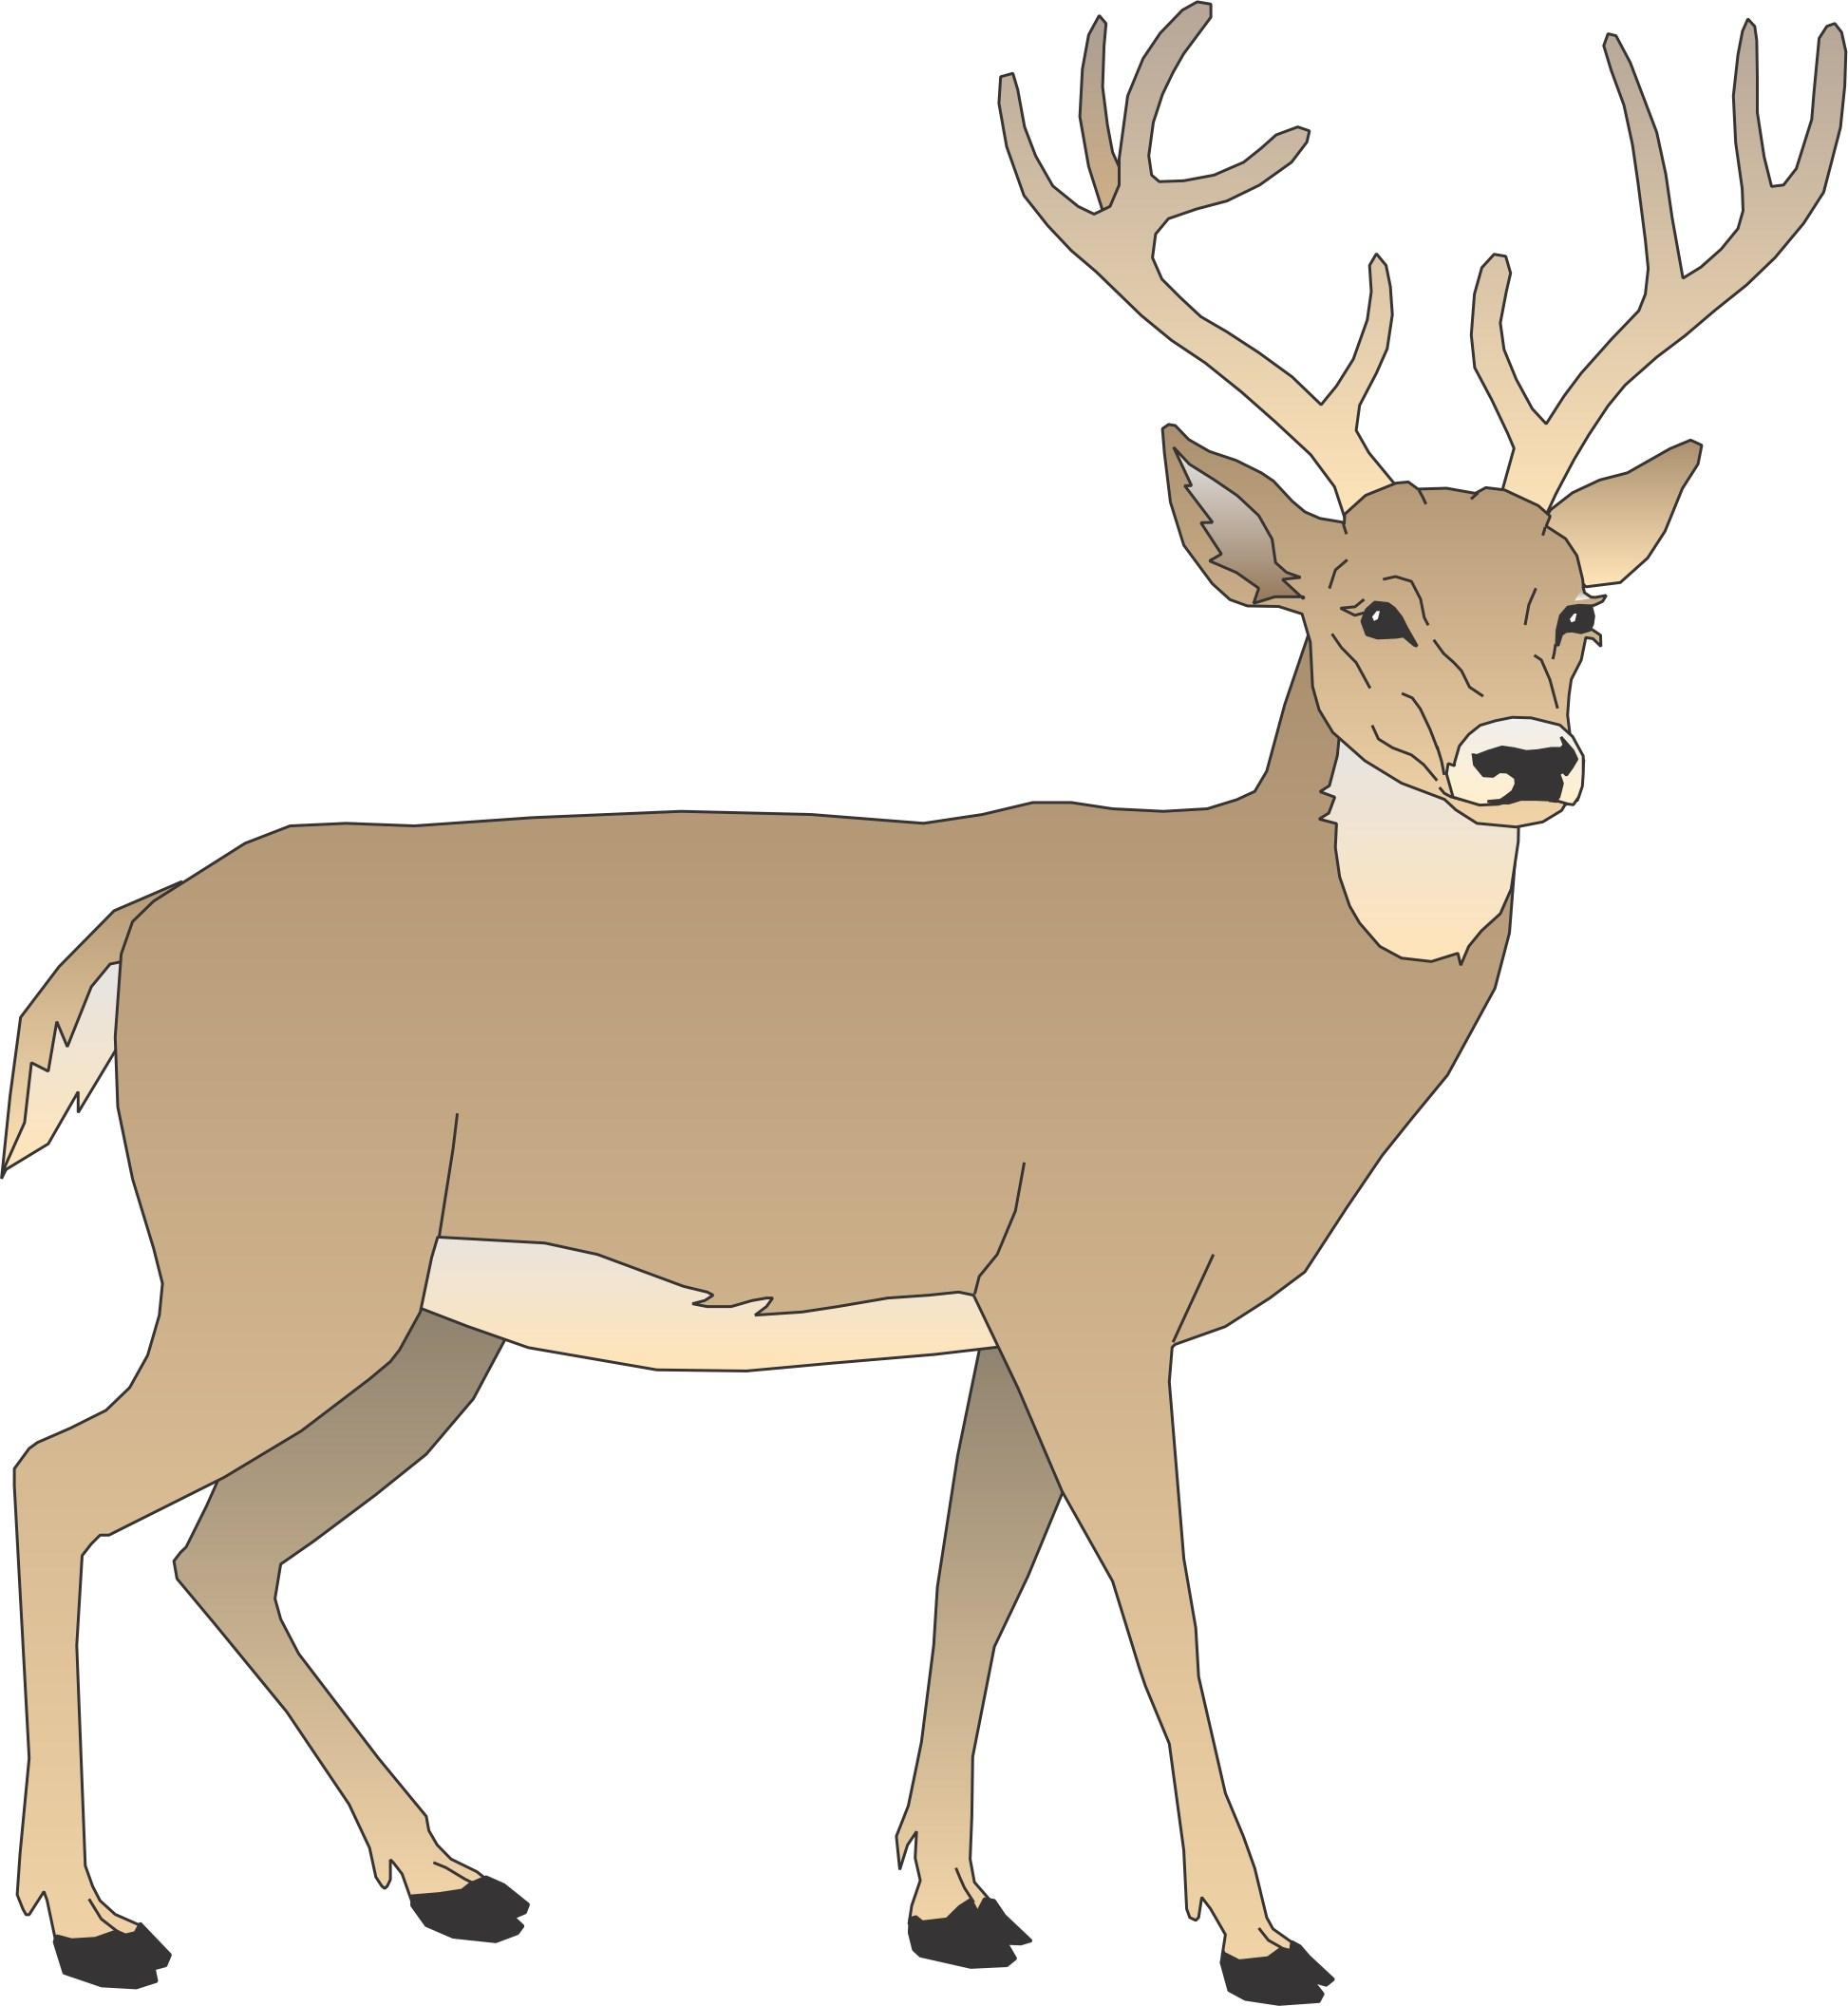 Cartoon deer clipart 9 » Clipart Portal.